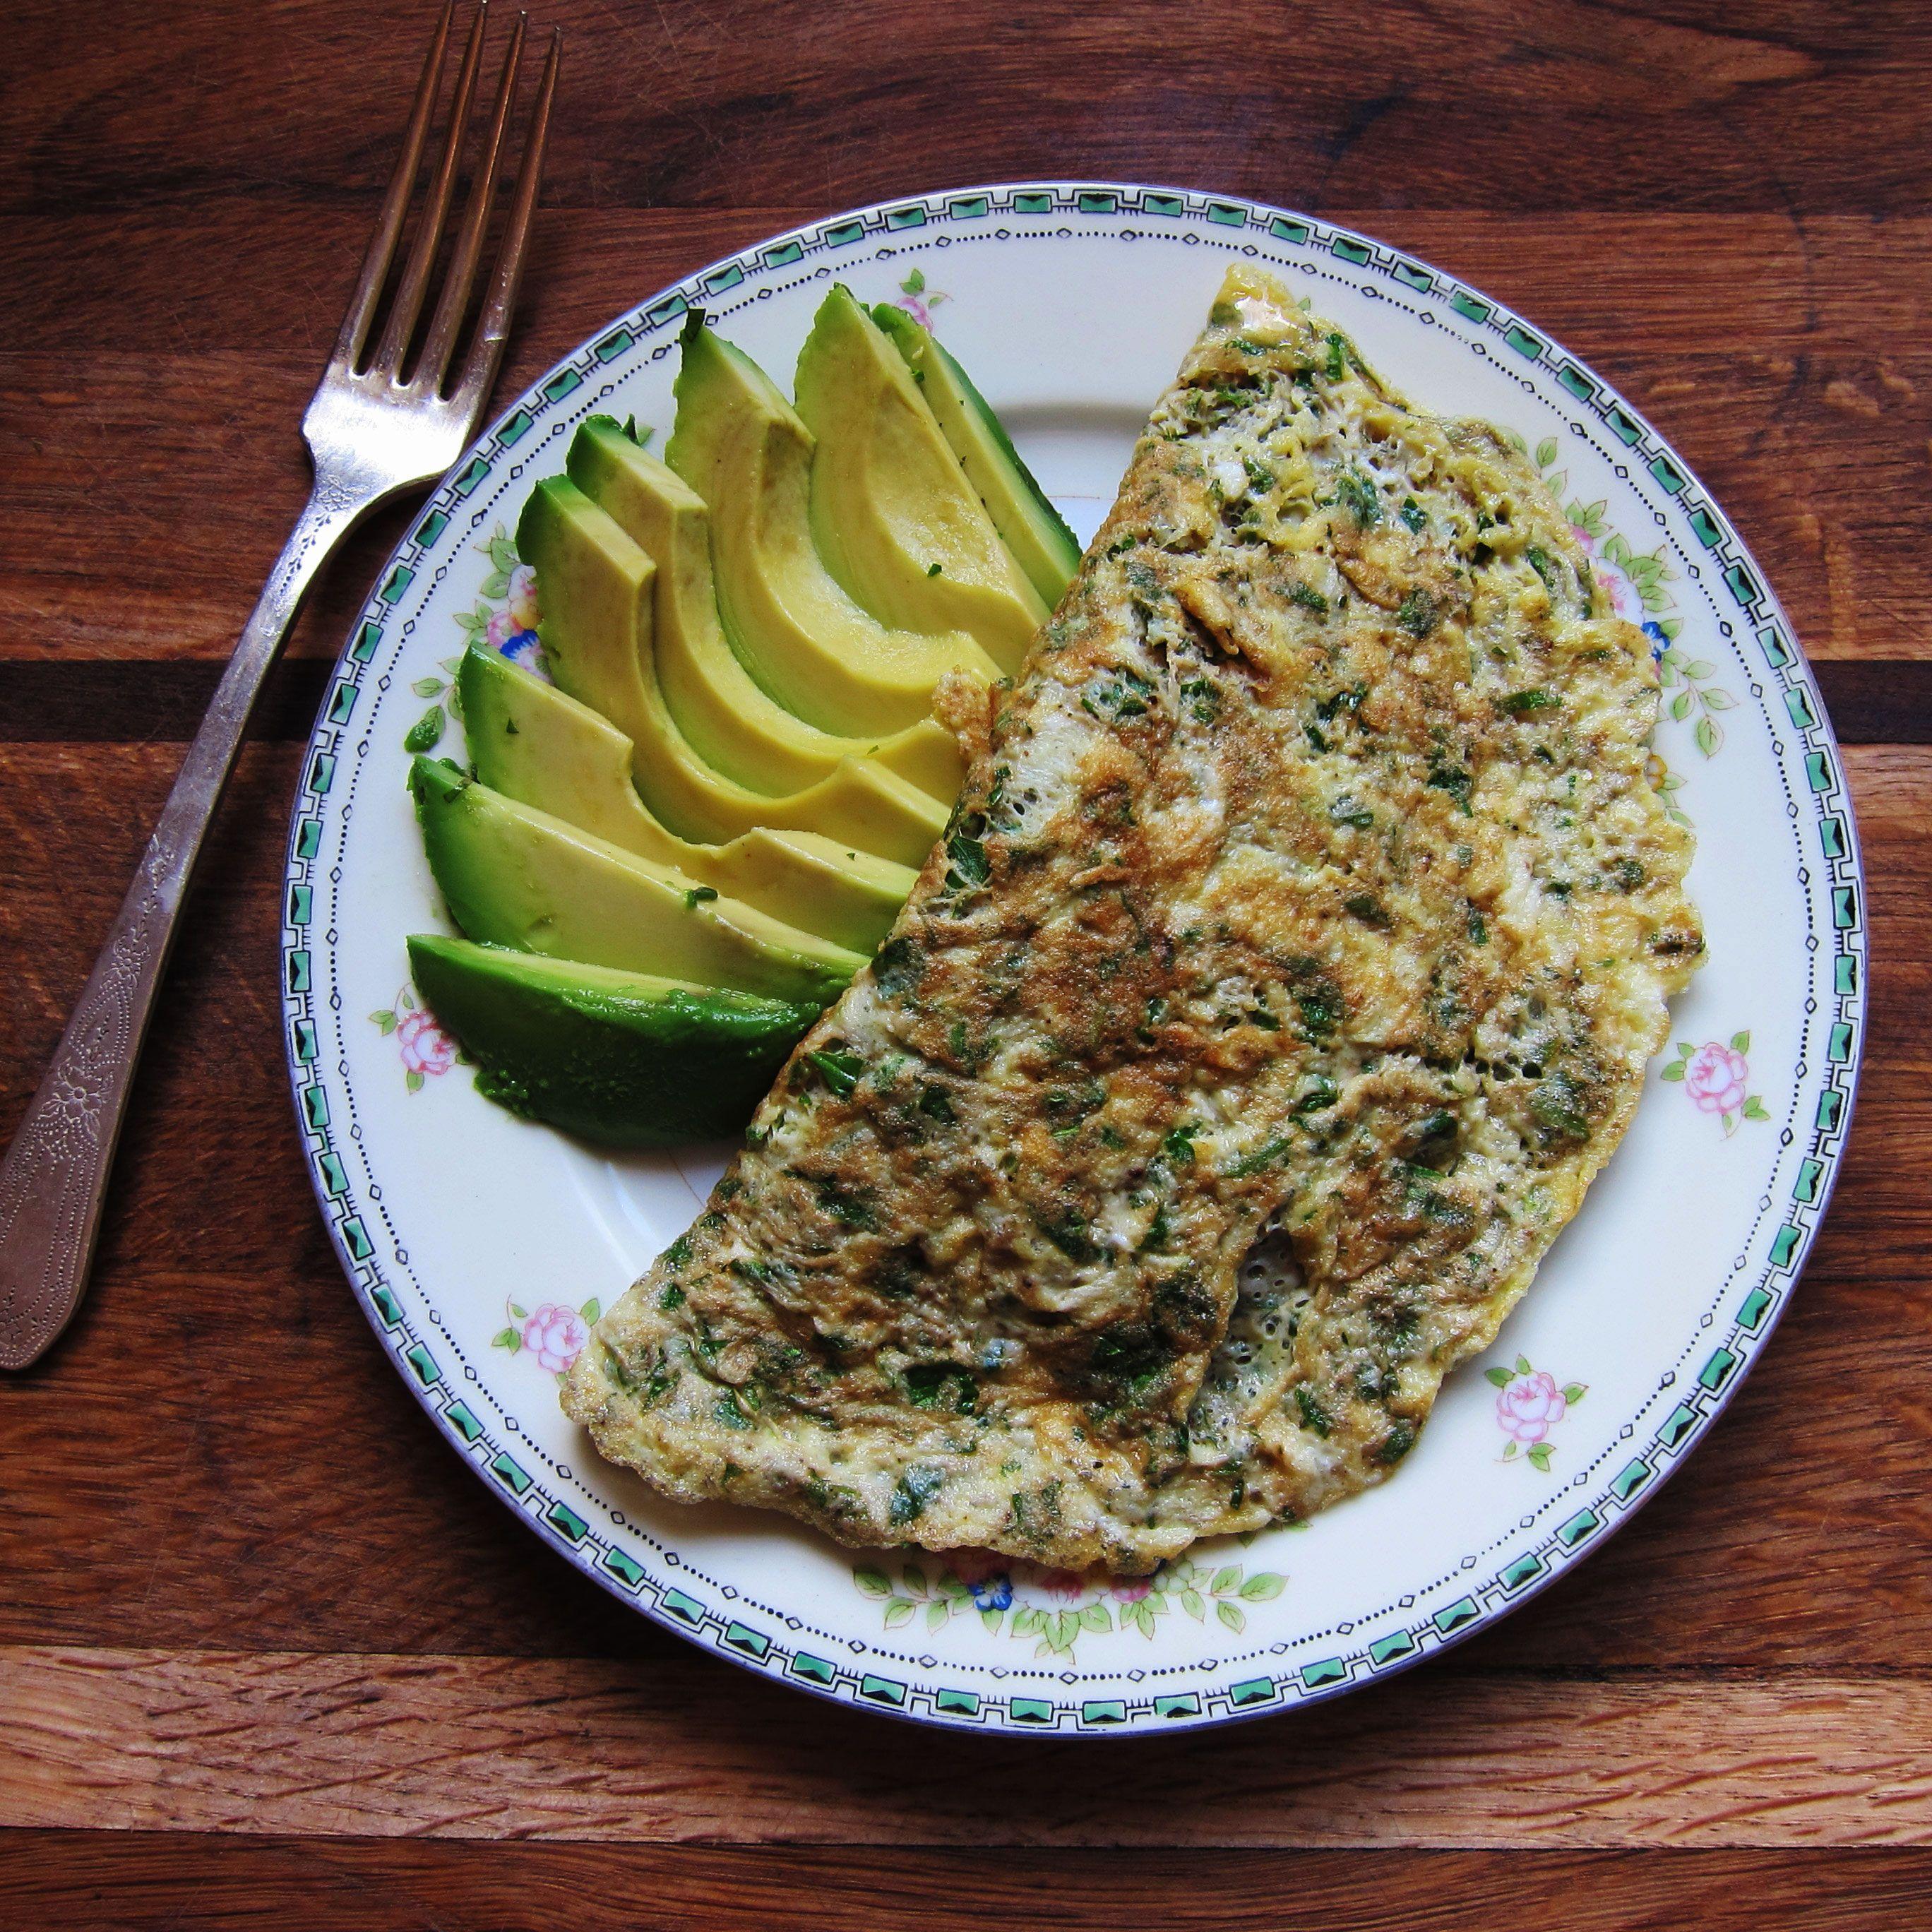 Omelette per pranzo, omelette per tutti! http://lifeg.at/14WAxrP